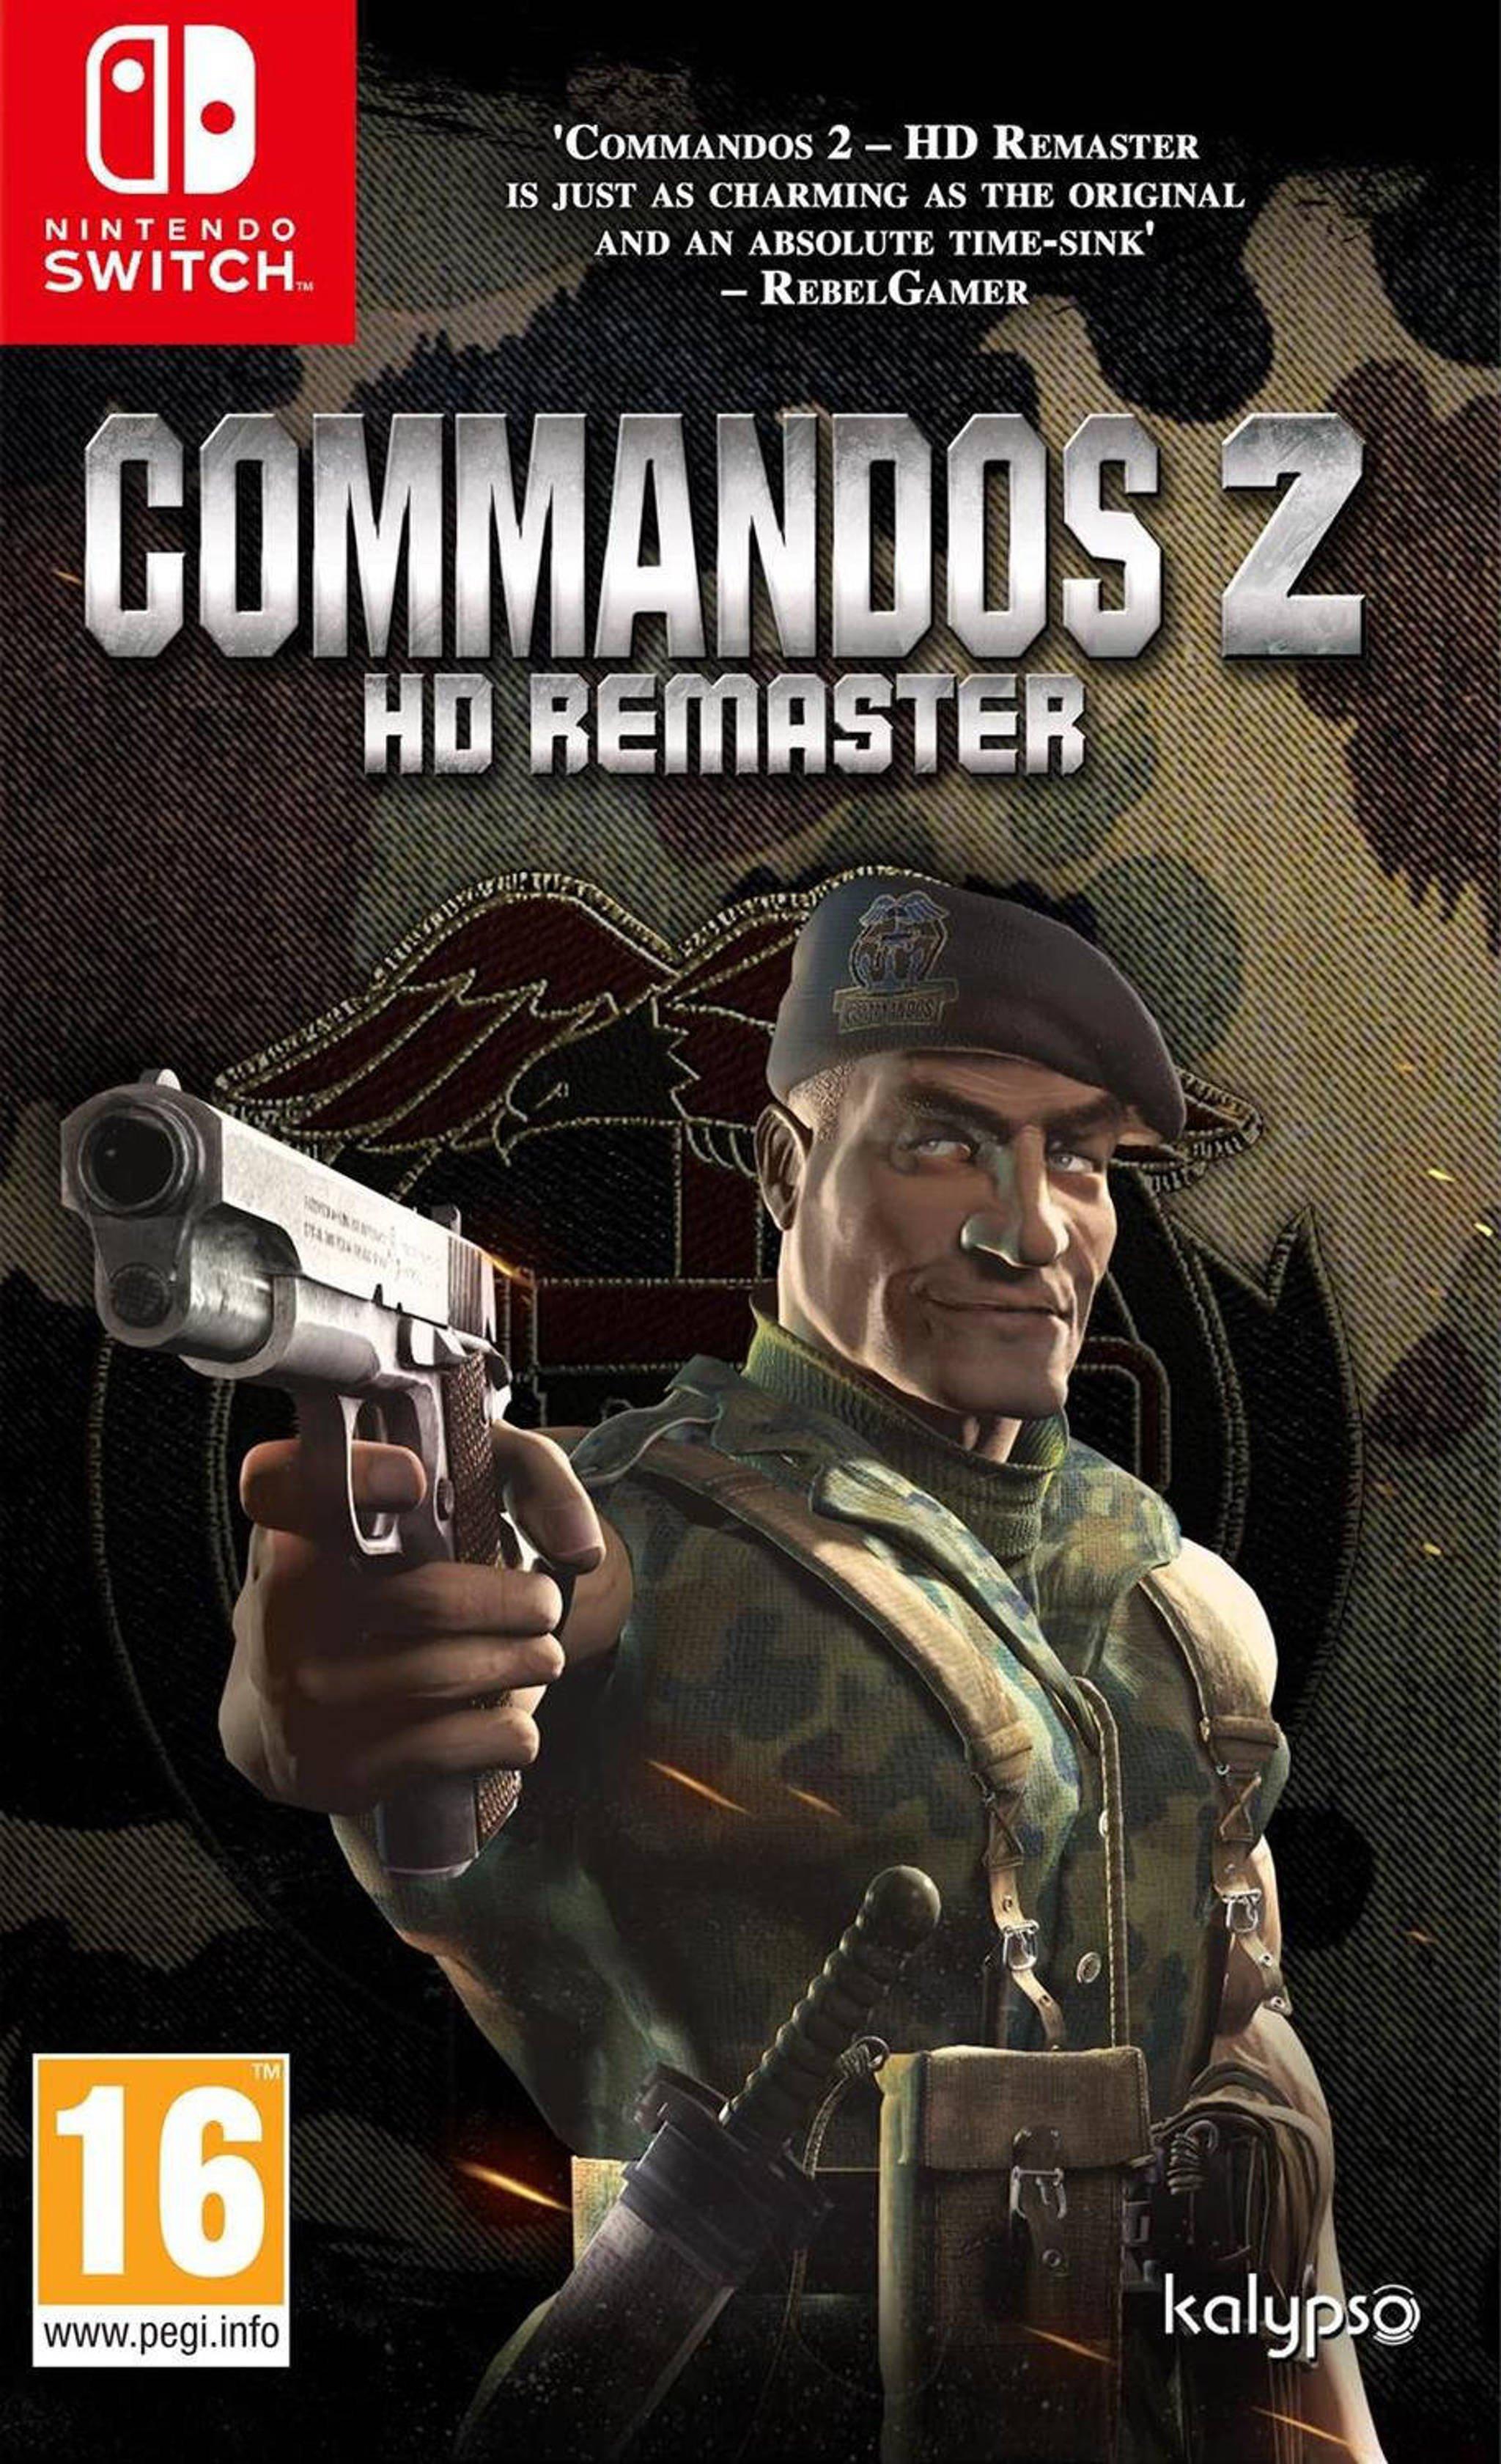 Commandos 2 HD Remaster (Nintendo Switch)